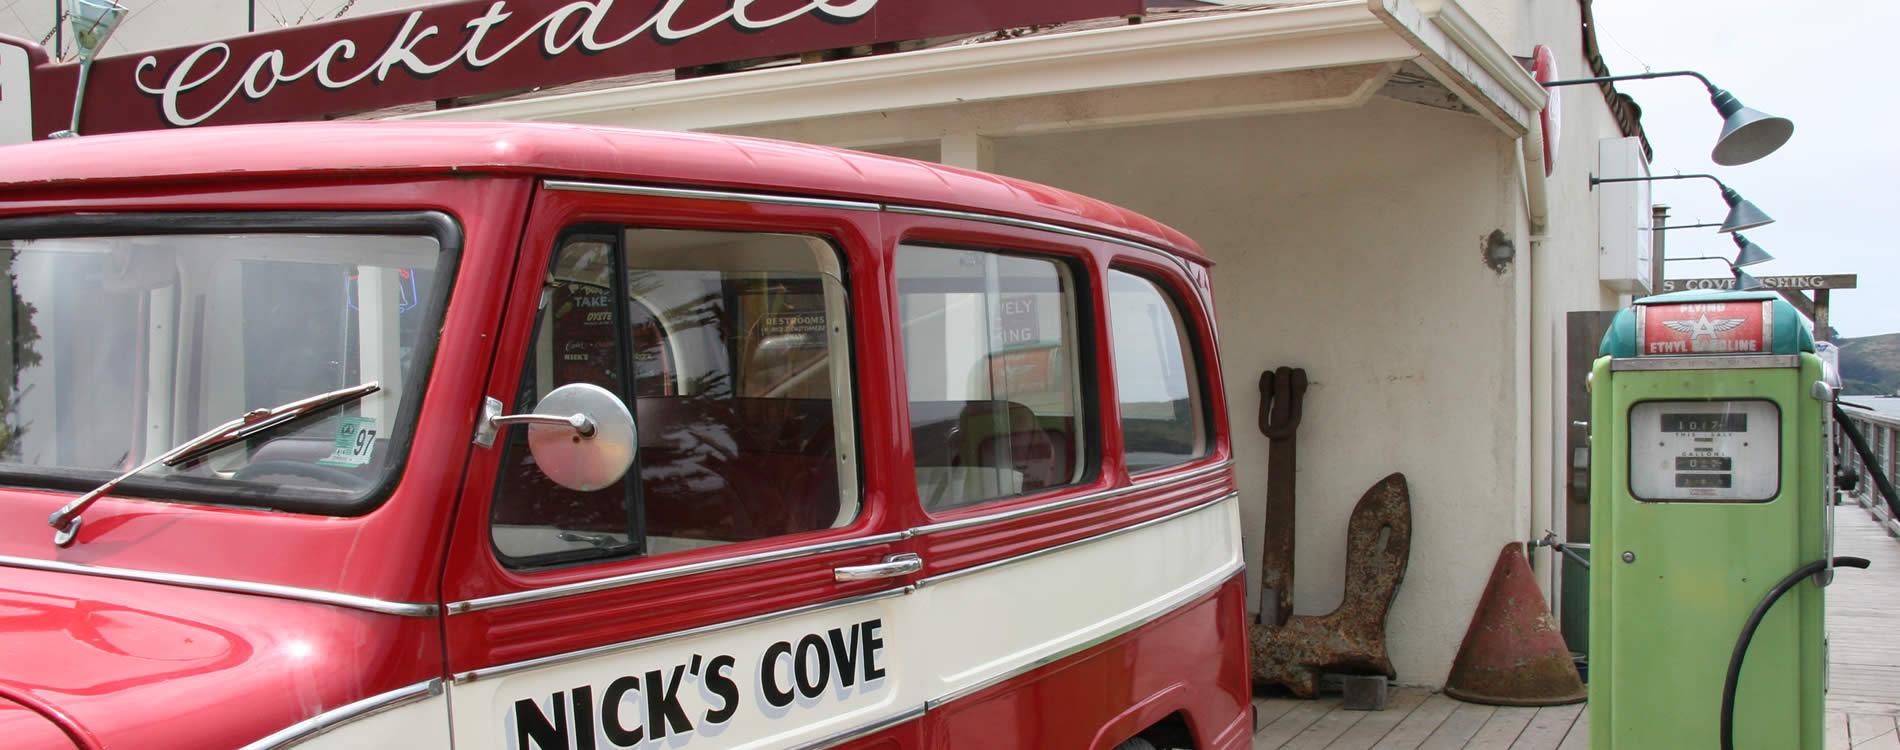 nicks cove marshall california point reyes national seashore